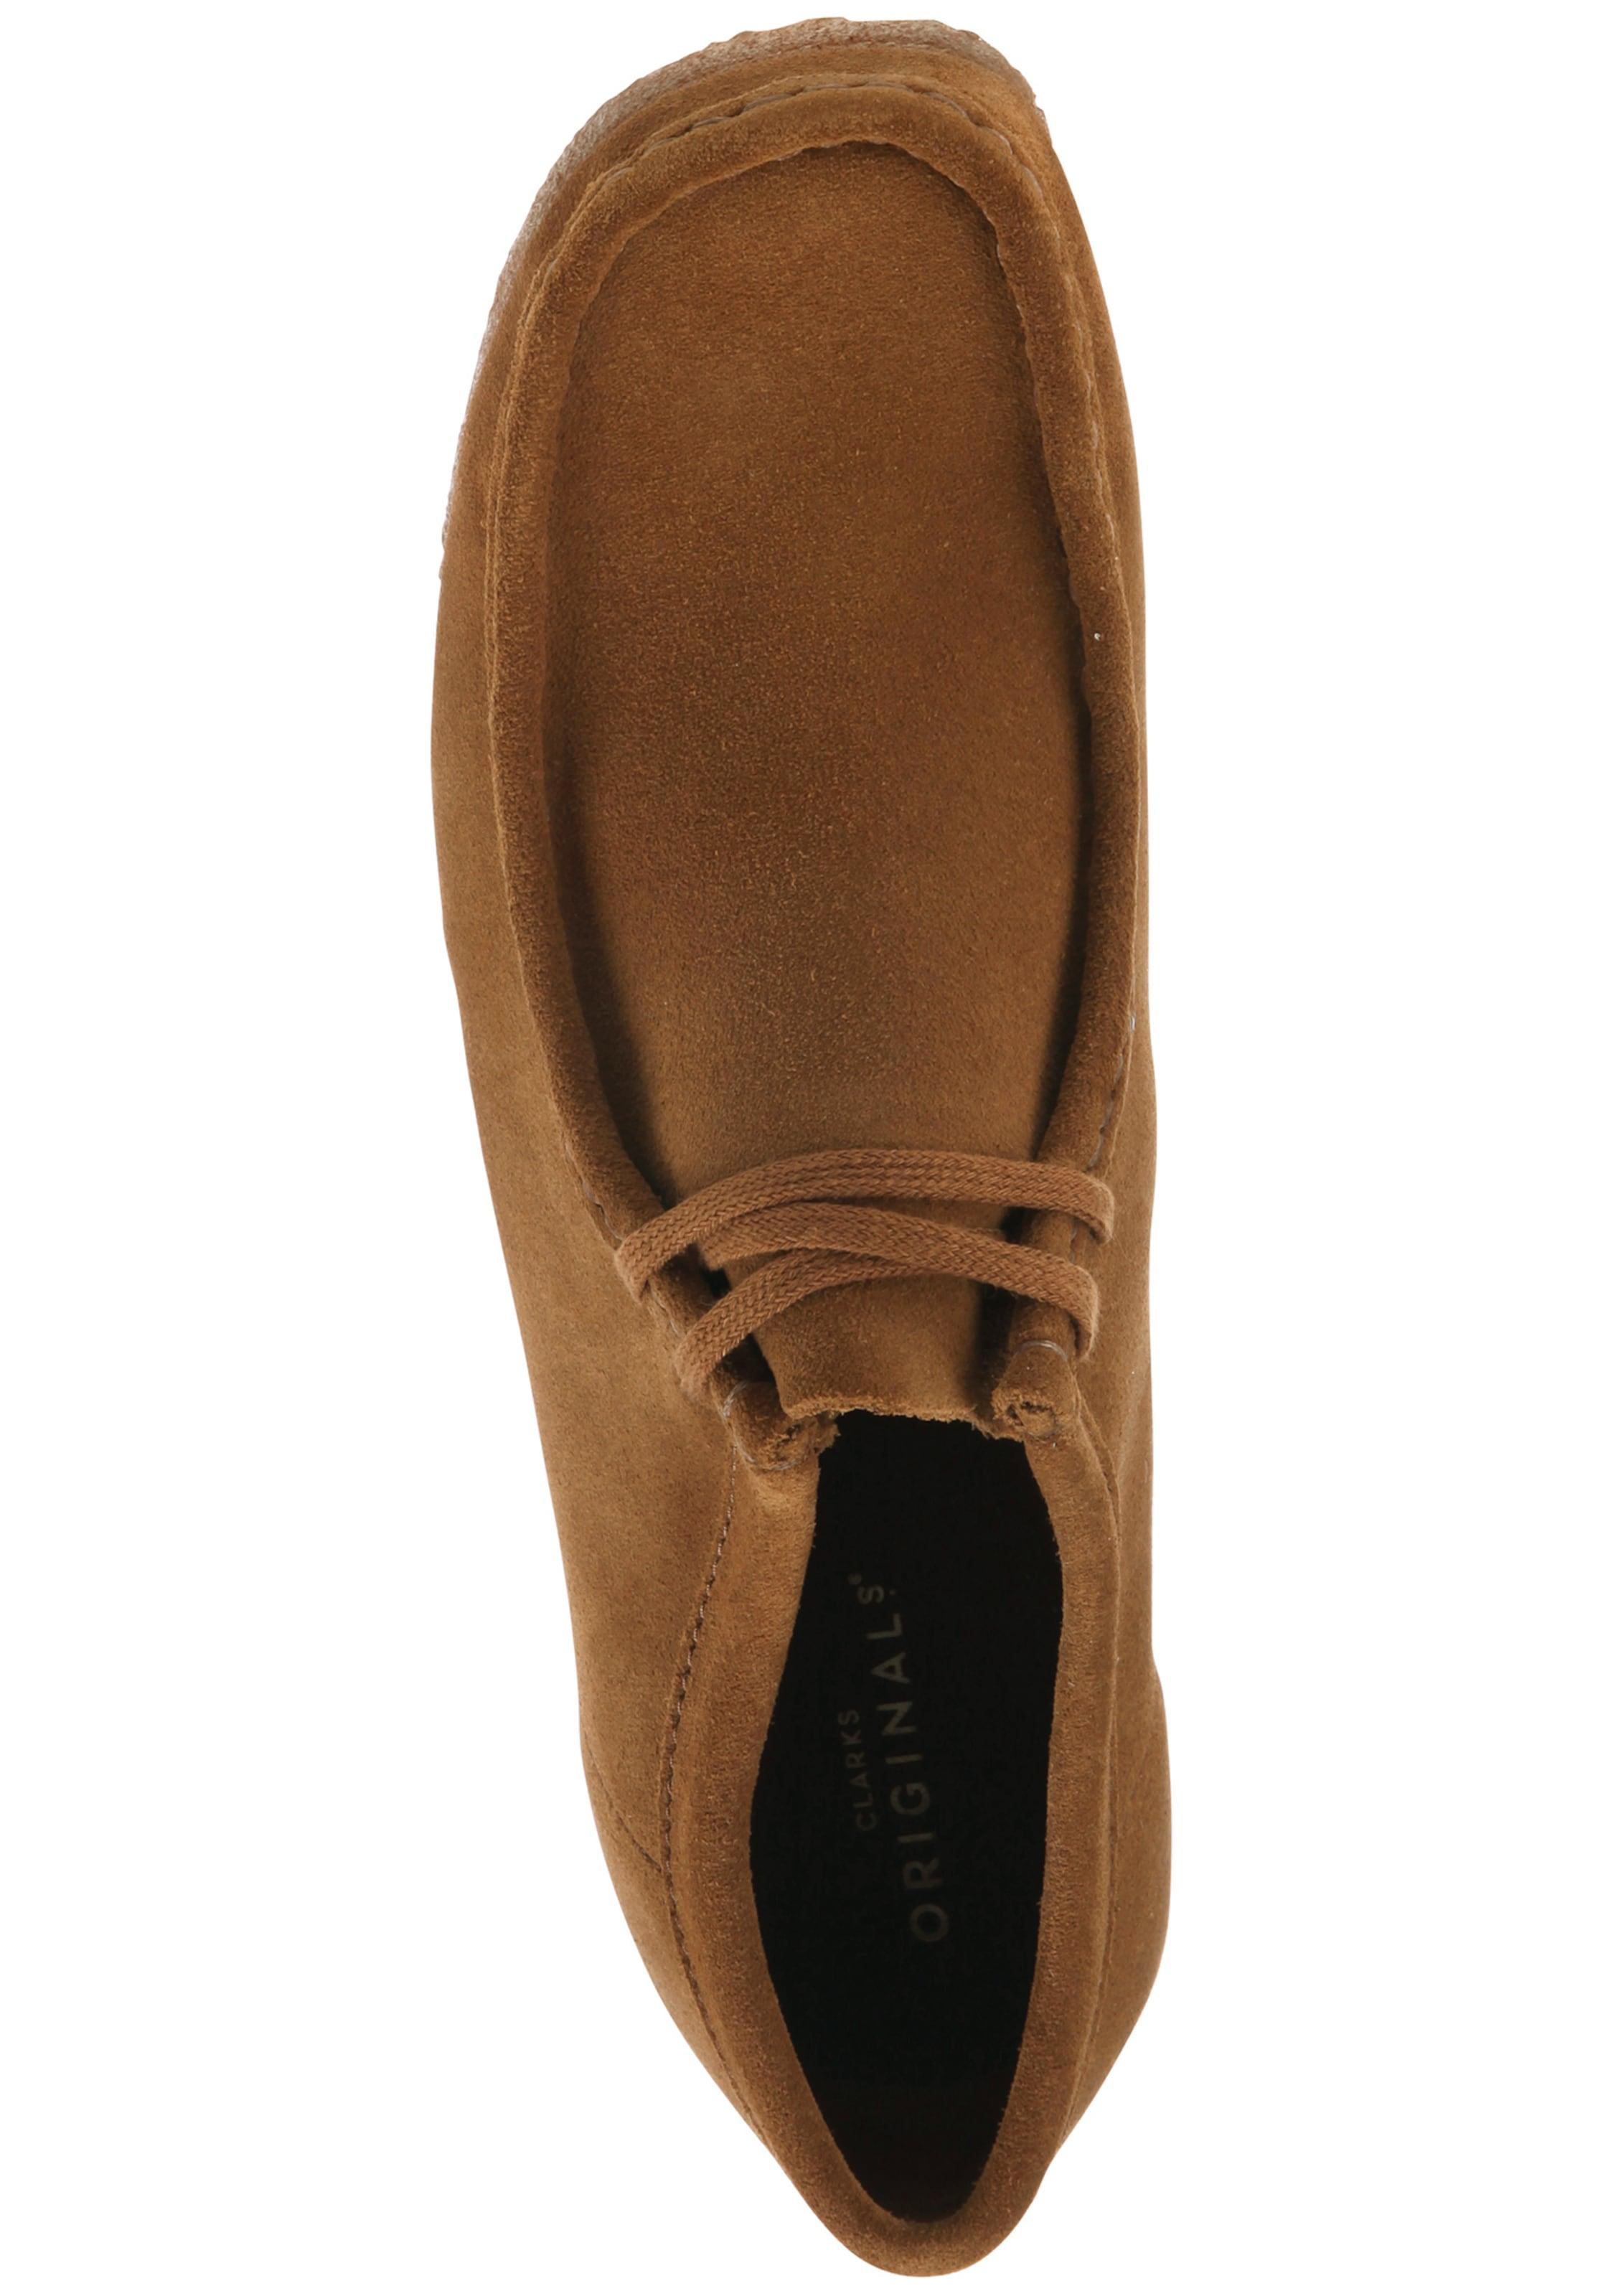 In Schuhe 'wallabee' Cognac Clarks Originals jpGSzMqULV